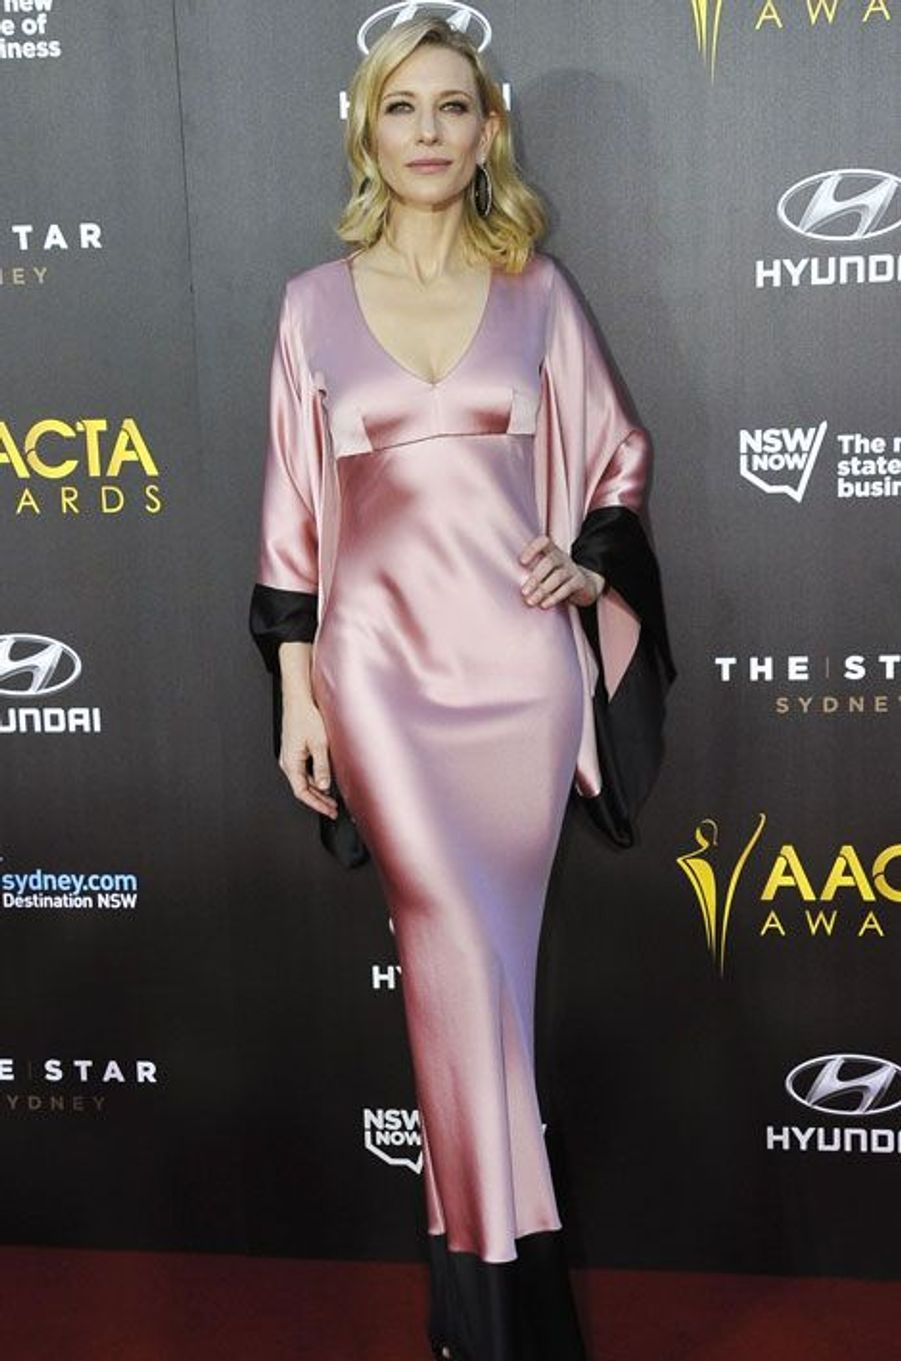 Cate Blanchett en Alexander McQueen lors du gala AACTA Awards Ceremony à Sydney, le 29 janvier 2015